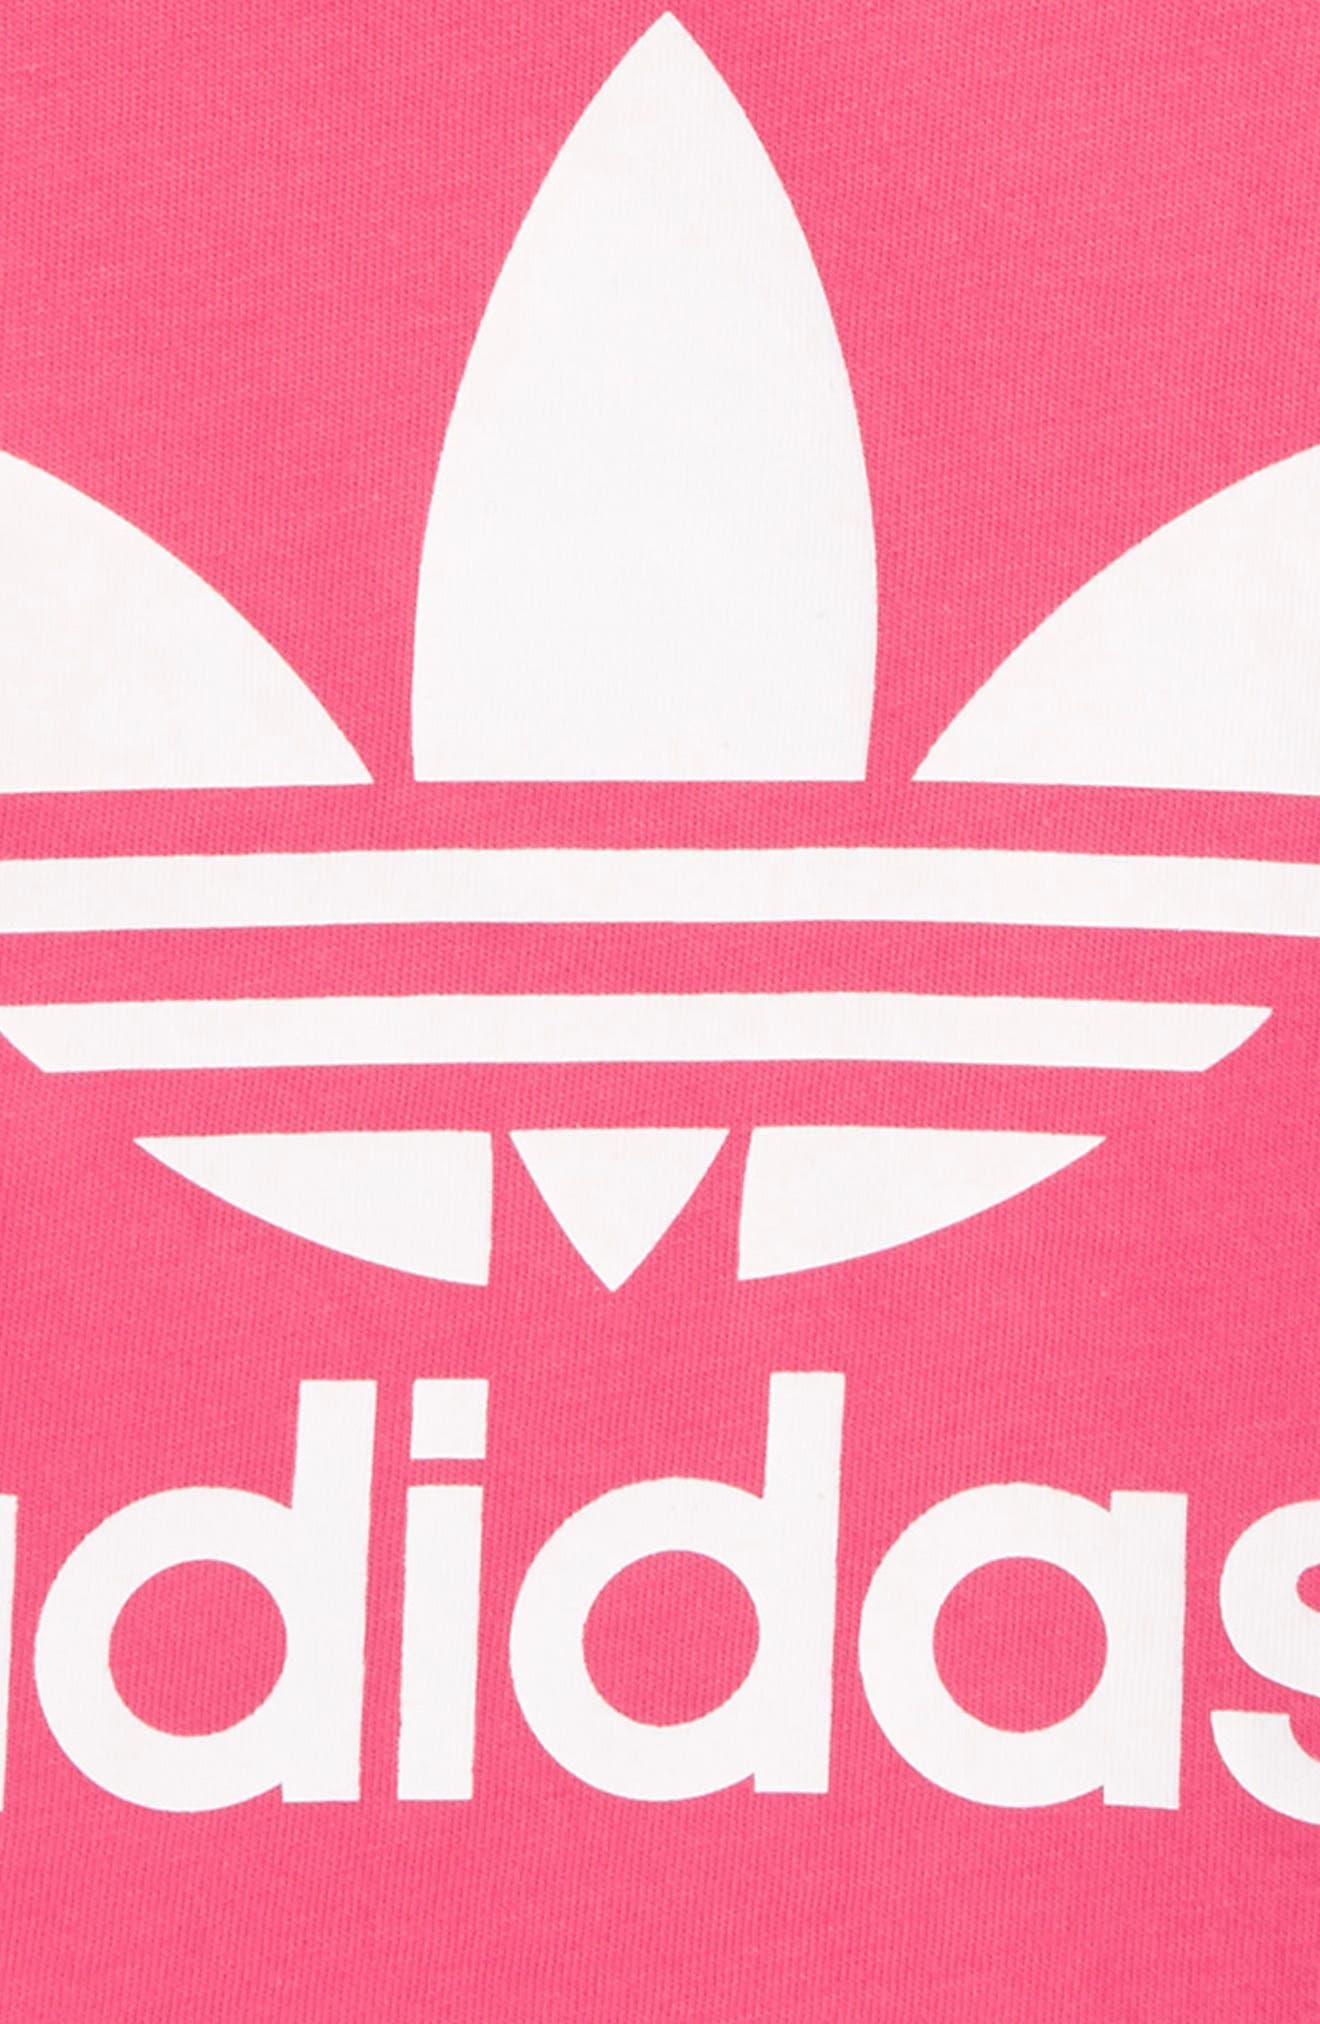 Originals Trefoil Logo Tee,                             Alternate thumbnail 2, color,                             REAL PINK / WHITE